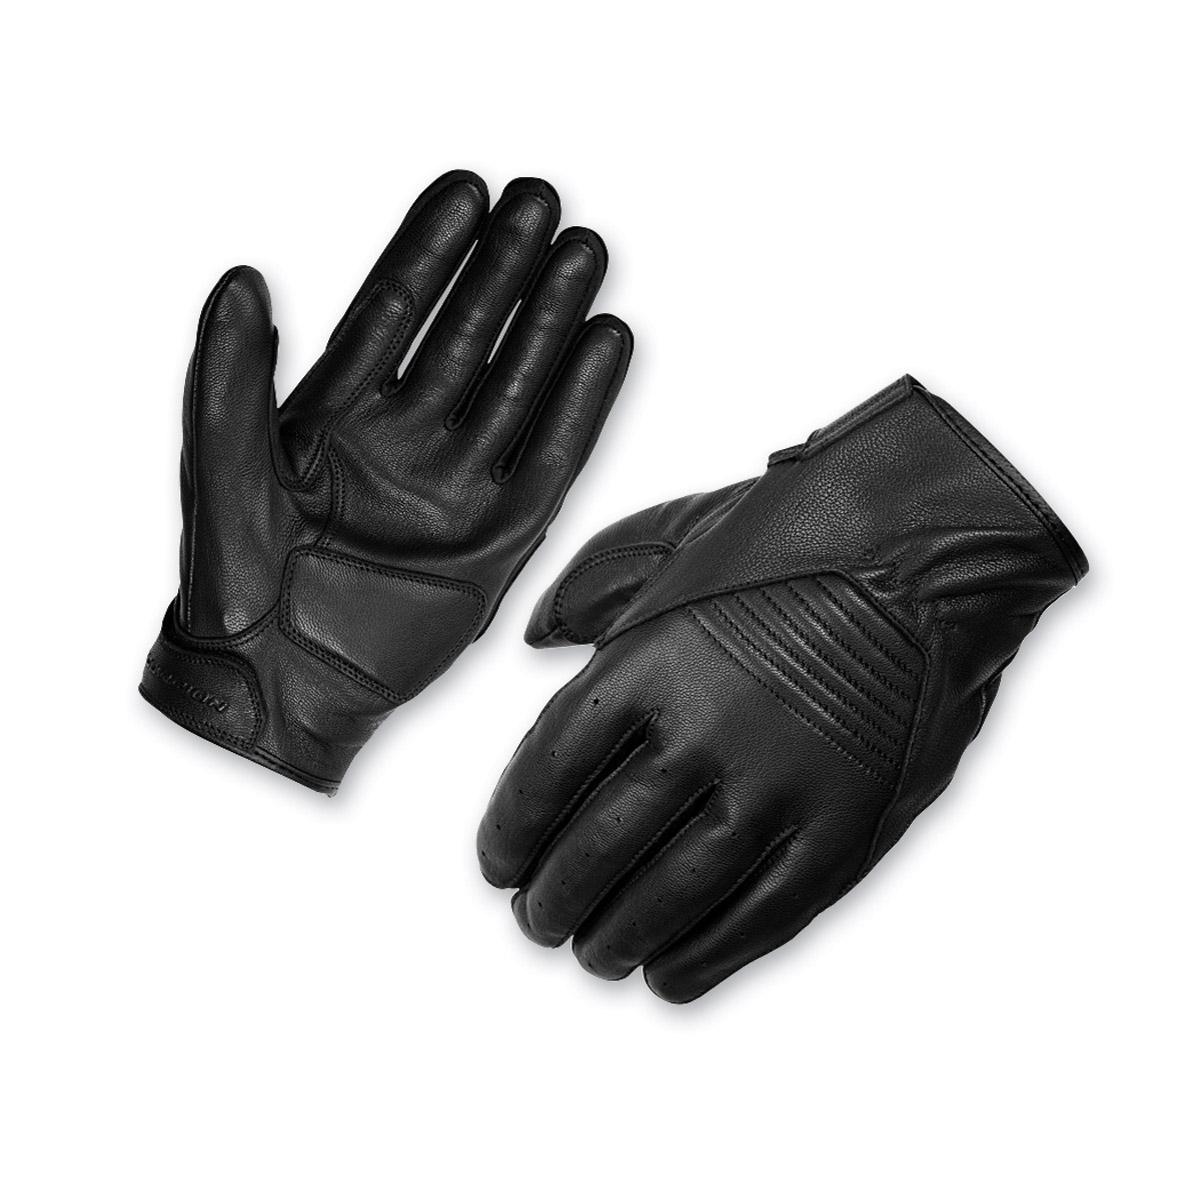 Scorpion EXO Men's Short-Cut Black Leather Gloves